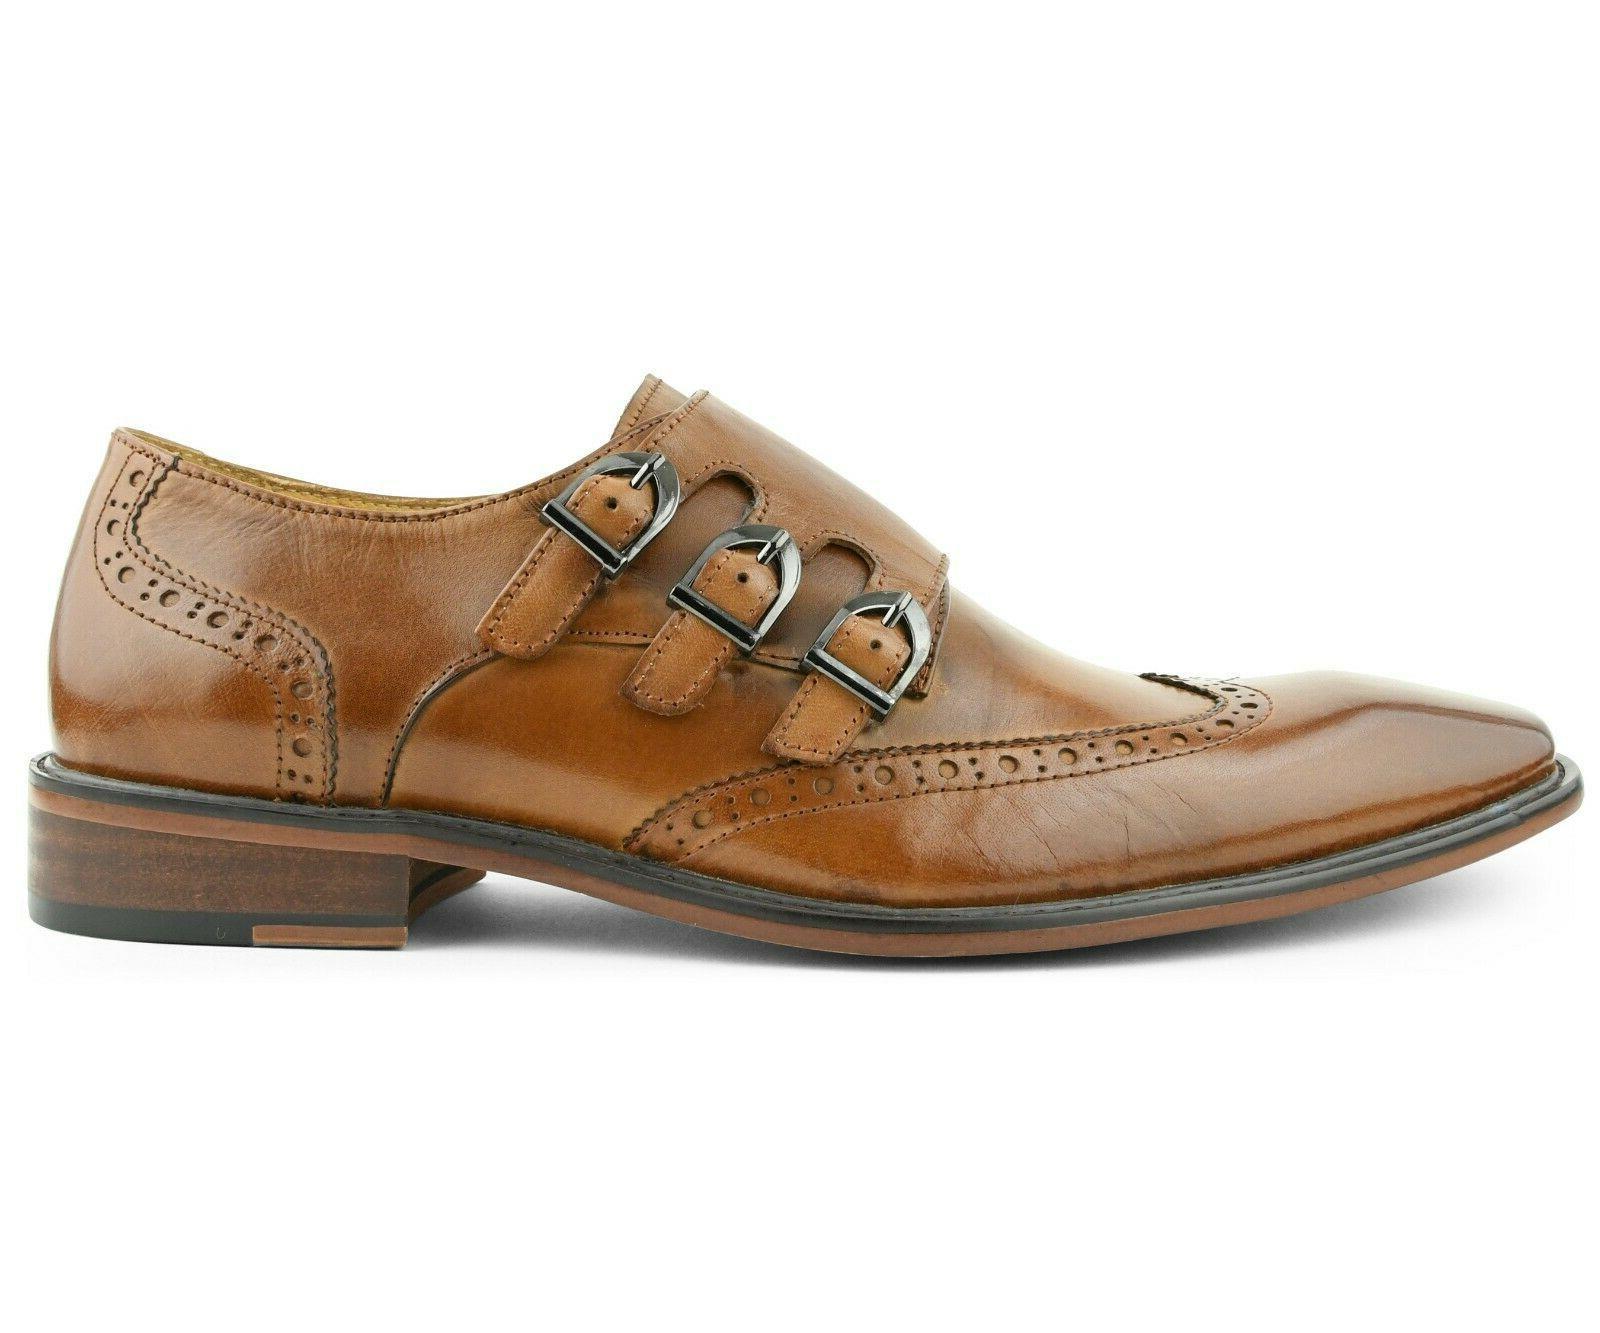 Men's Dress Shoes, Formal Monk